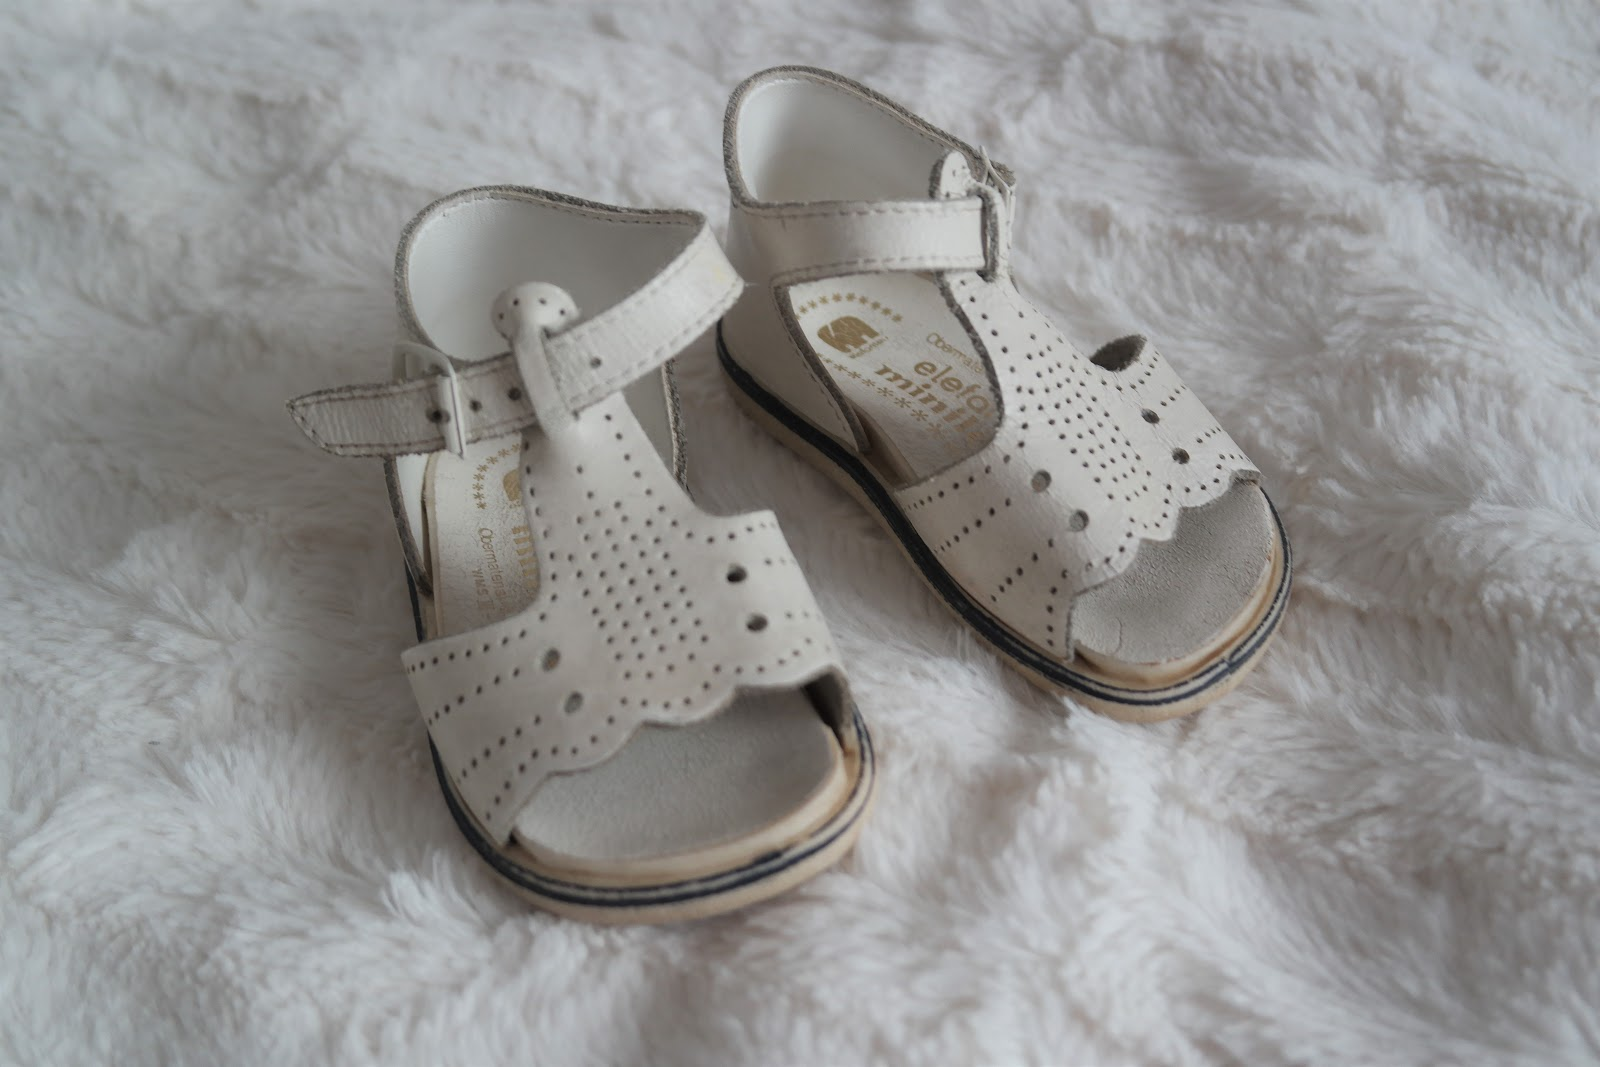 ensimmäiset kengät